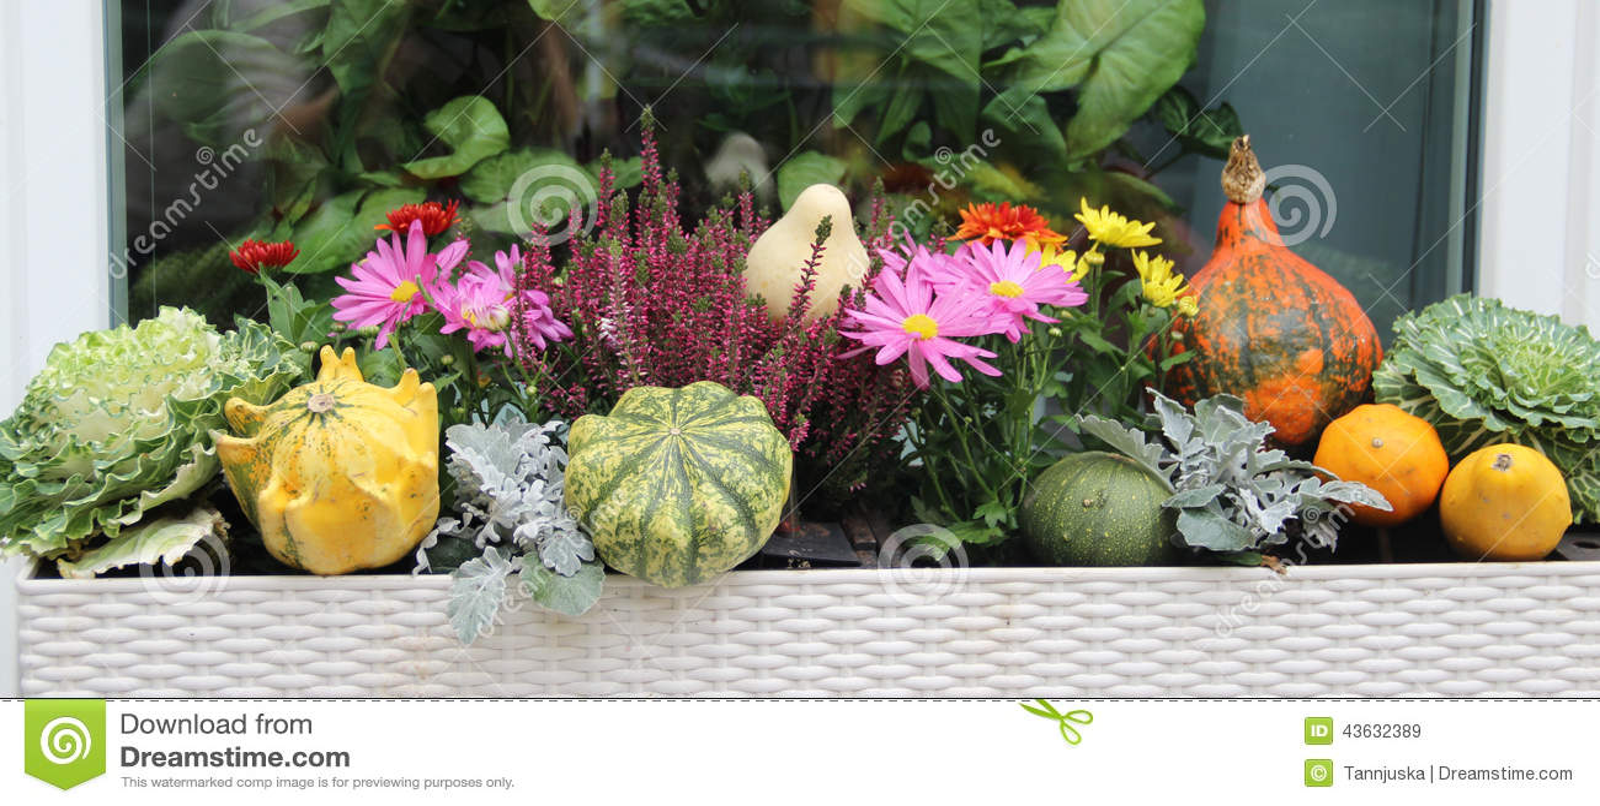 Mix Of Beautiful Vivid Terrace Fall Flowers And Pumpkin Stock Image